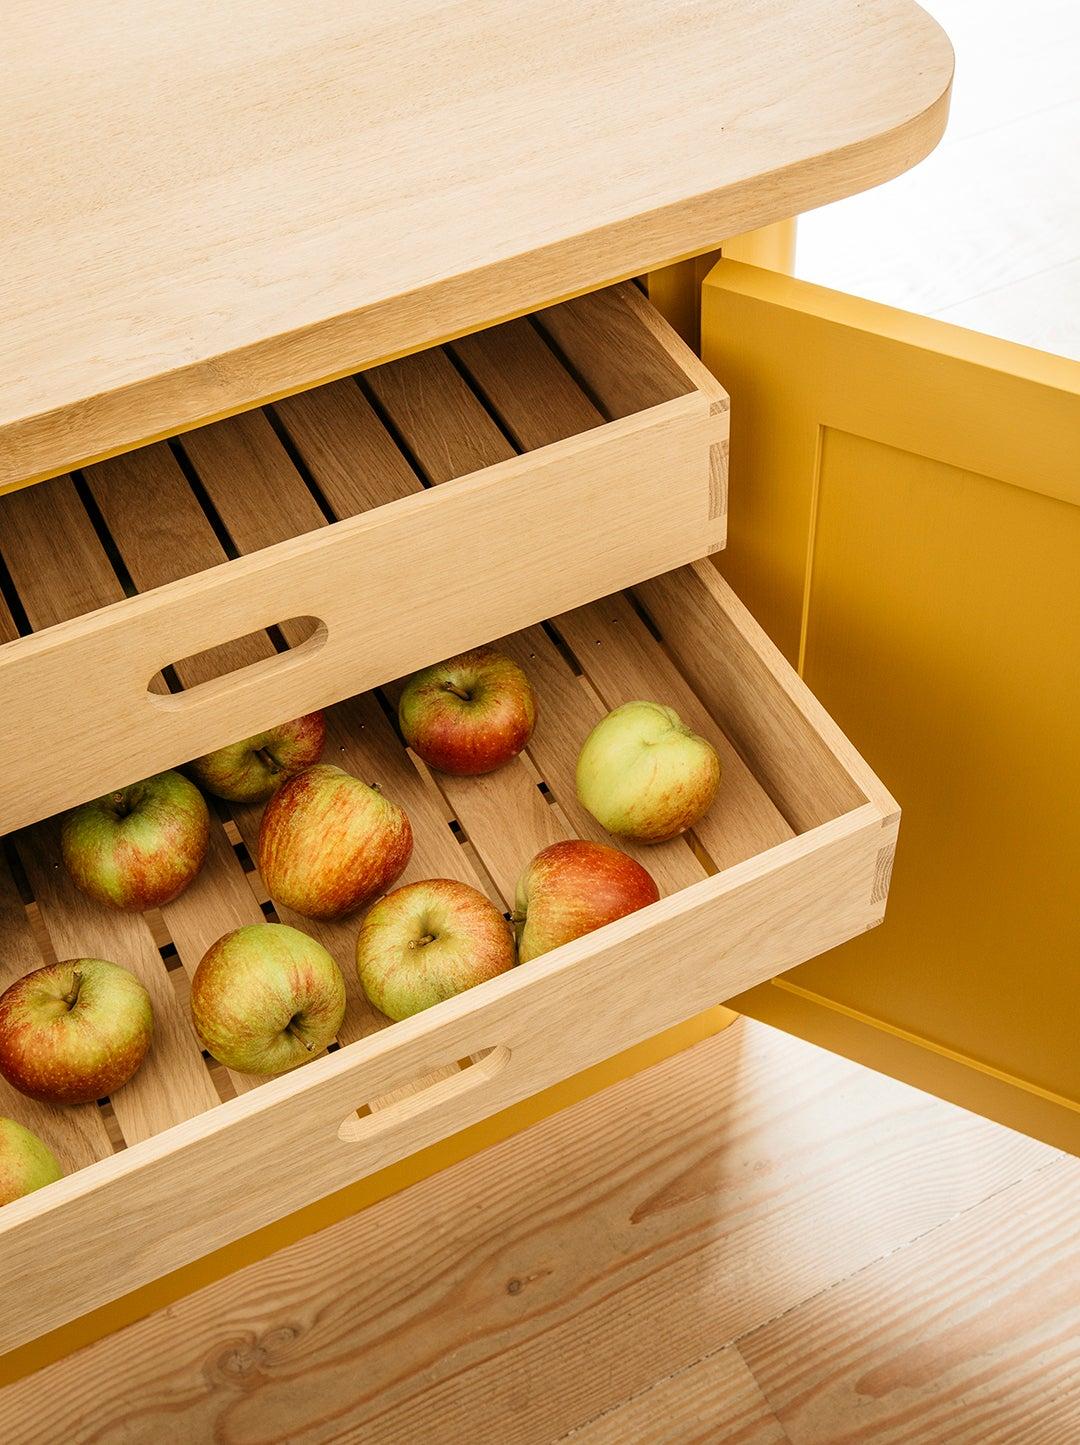 00-FEATURE-fruit-storage-ideas-domino